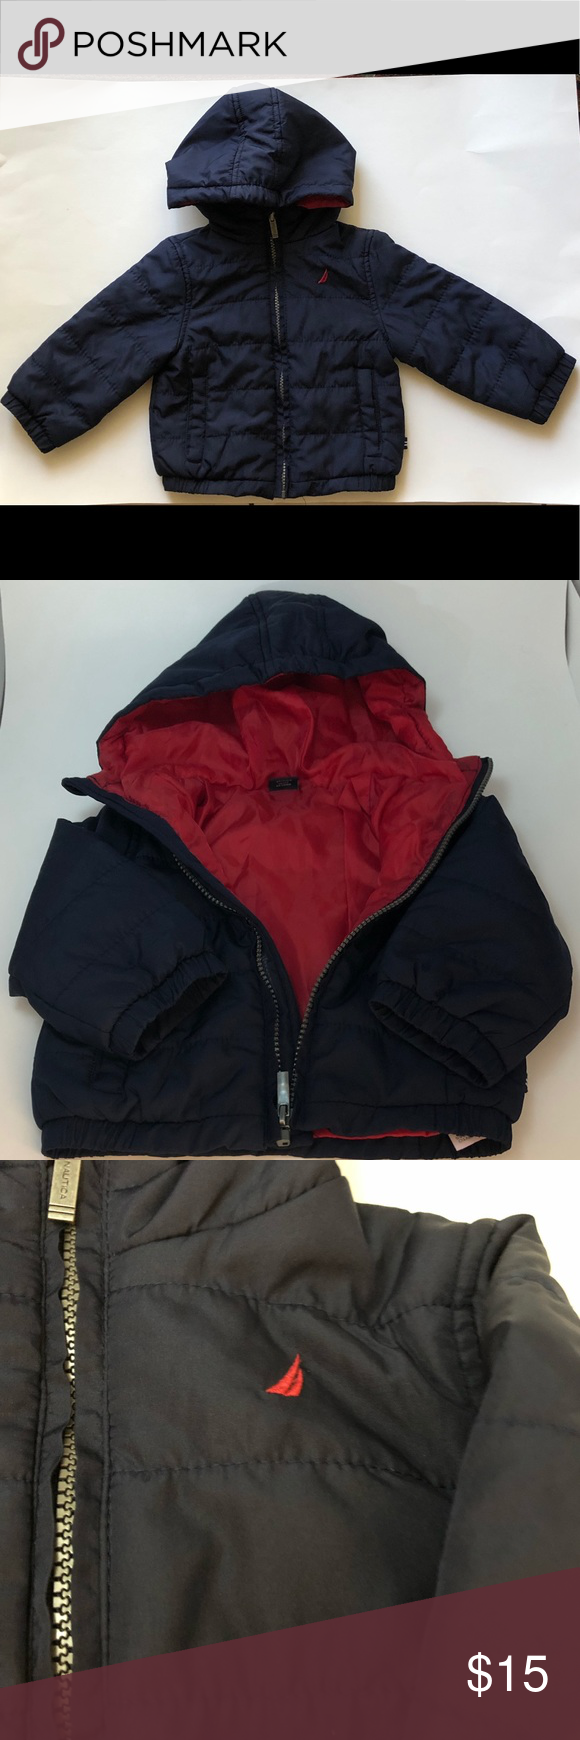 Nautica Puffer Jacket Blue Puffer Jacket Black Fleece Jacket Black Puffer Coat [ 1740 x 580 Pixel ]